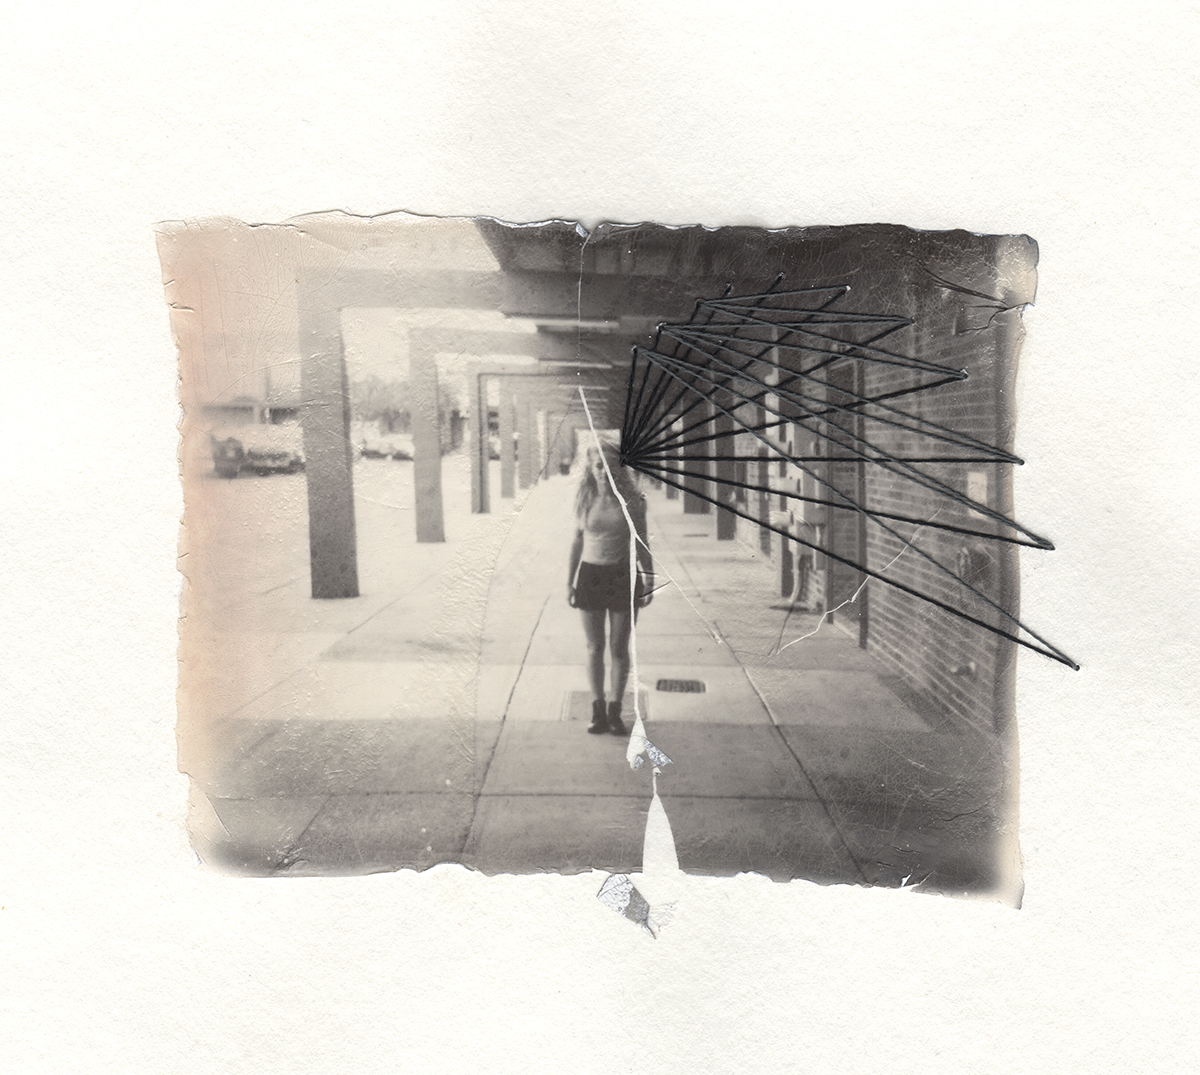 Hallway | Polaroid Spectra | Impossible Project Spectra BW | Emulsion Lift With Thread | Jocelyn Mathewes | @jocelynmathewes